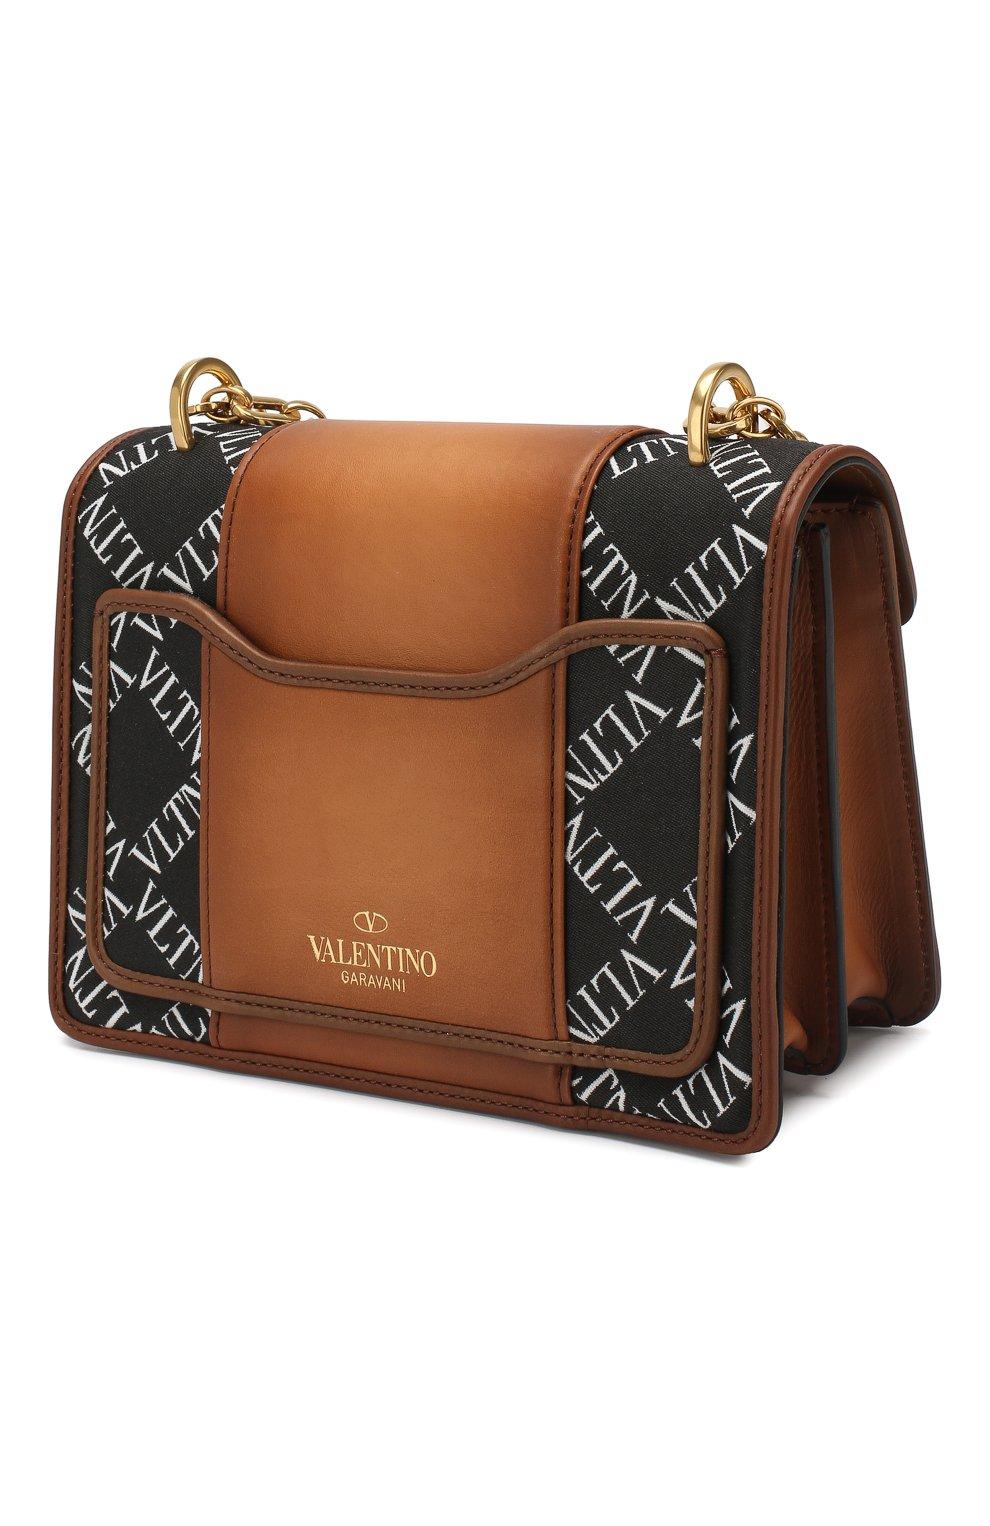 Сумка Valentino Garavani Uptown small Valentino коричневая цвета | Фото №3